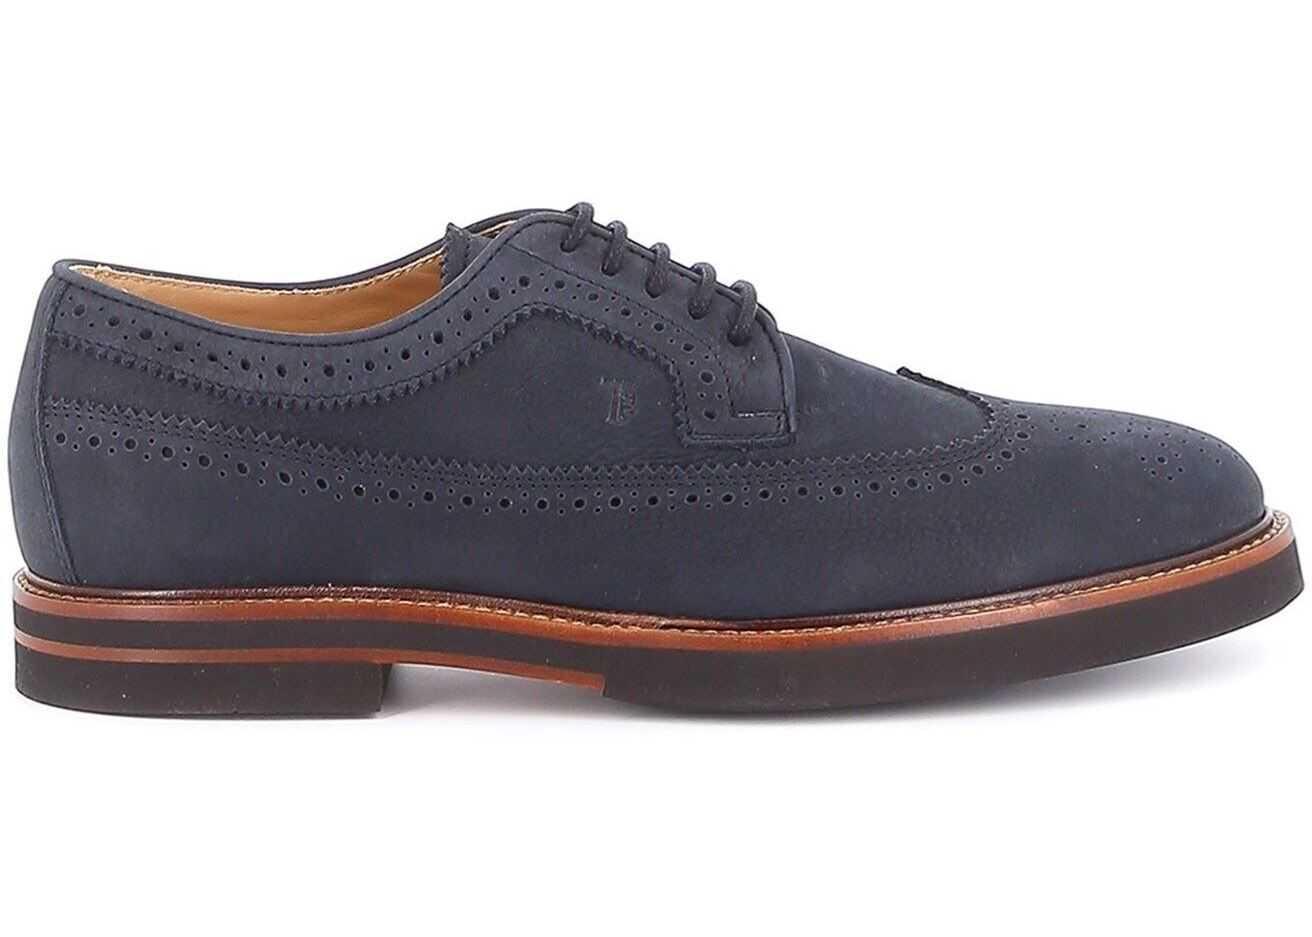 TOD'S Brogue Shoes In Blue XXM53B00C106RNU810 Blue imagine b-mall.ro